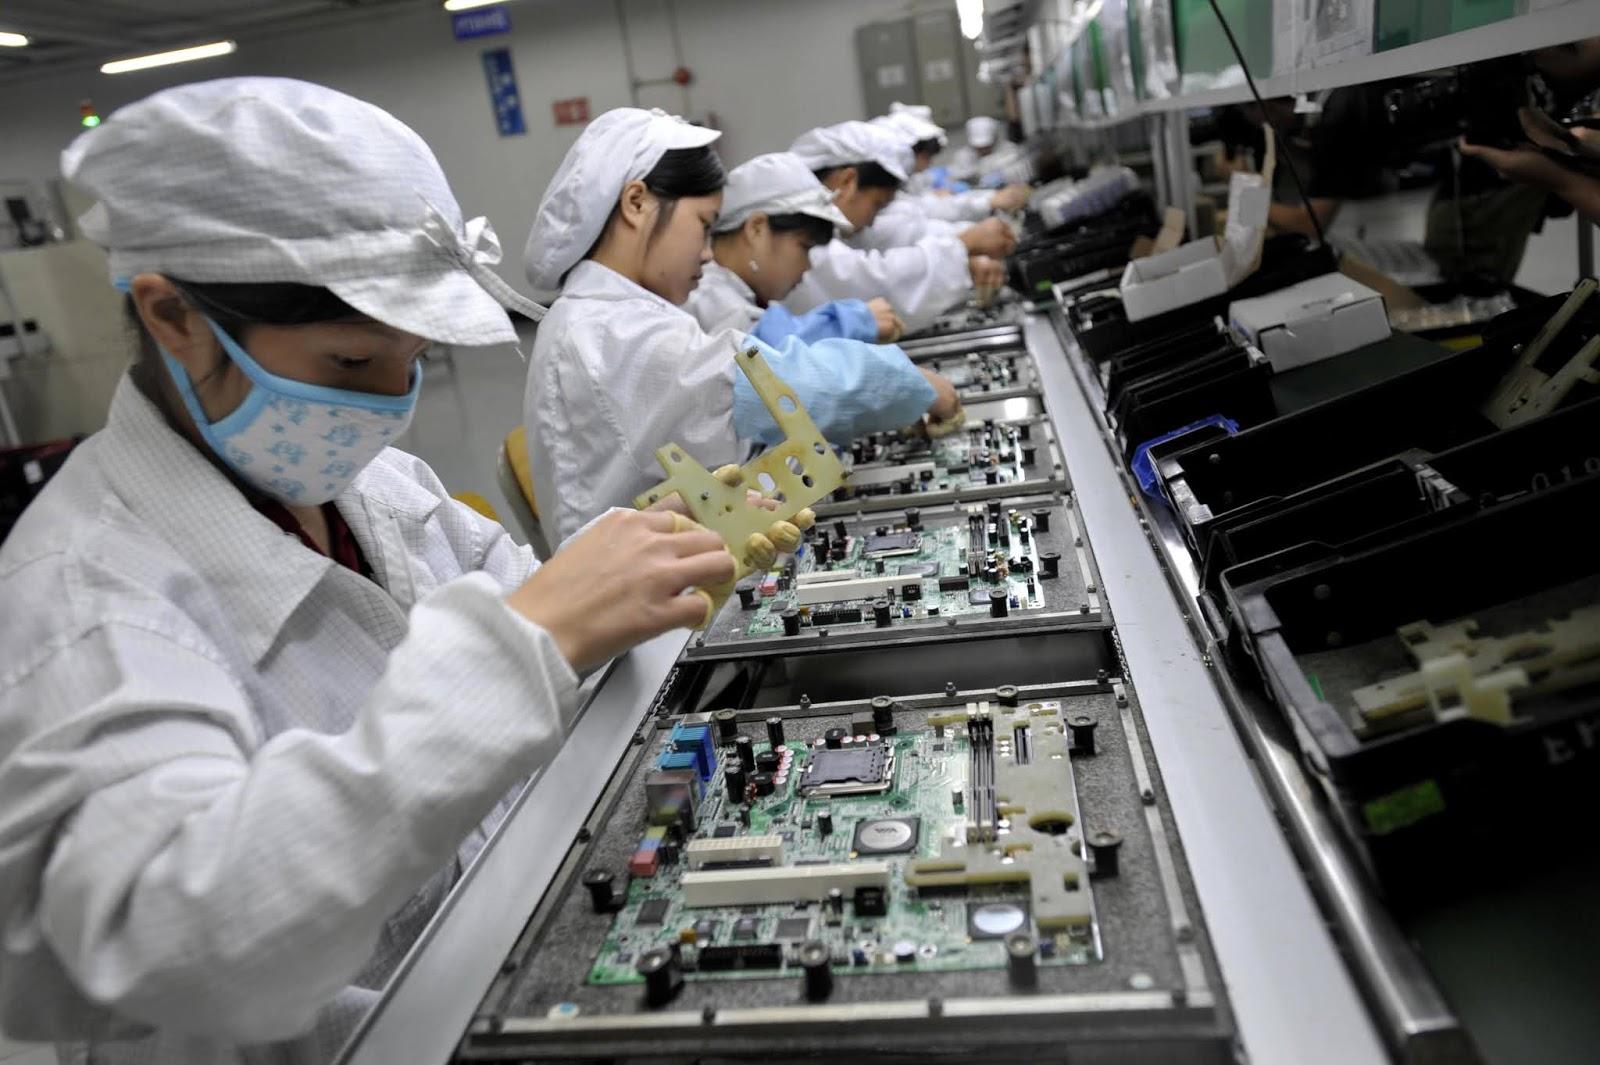 foxconn-akan-membangun-pabrik-perakitan-dan-pengujian-chip-5g-di-cina